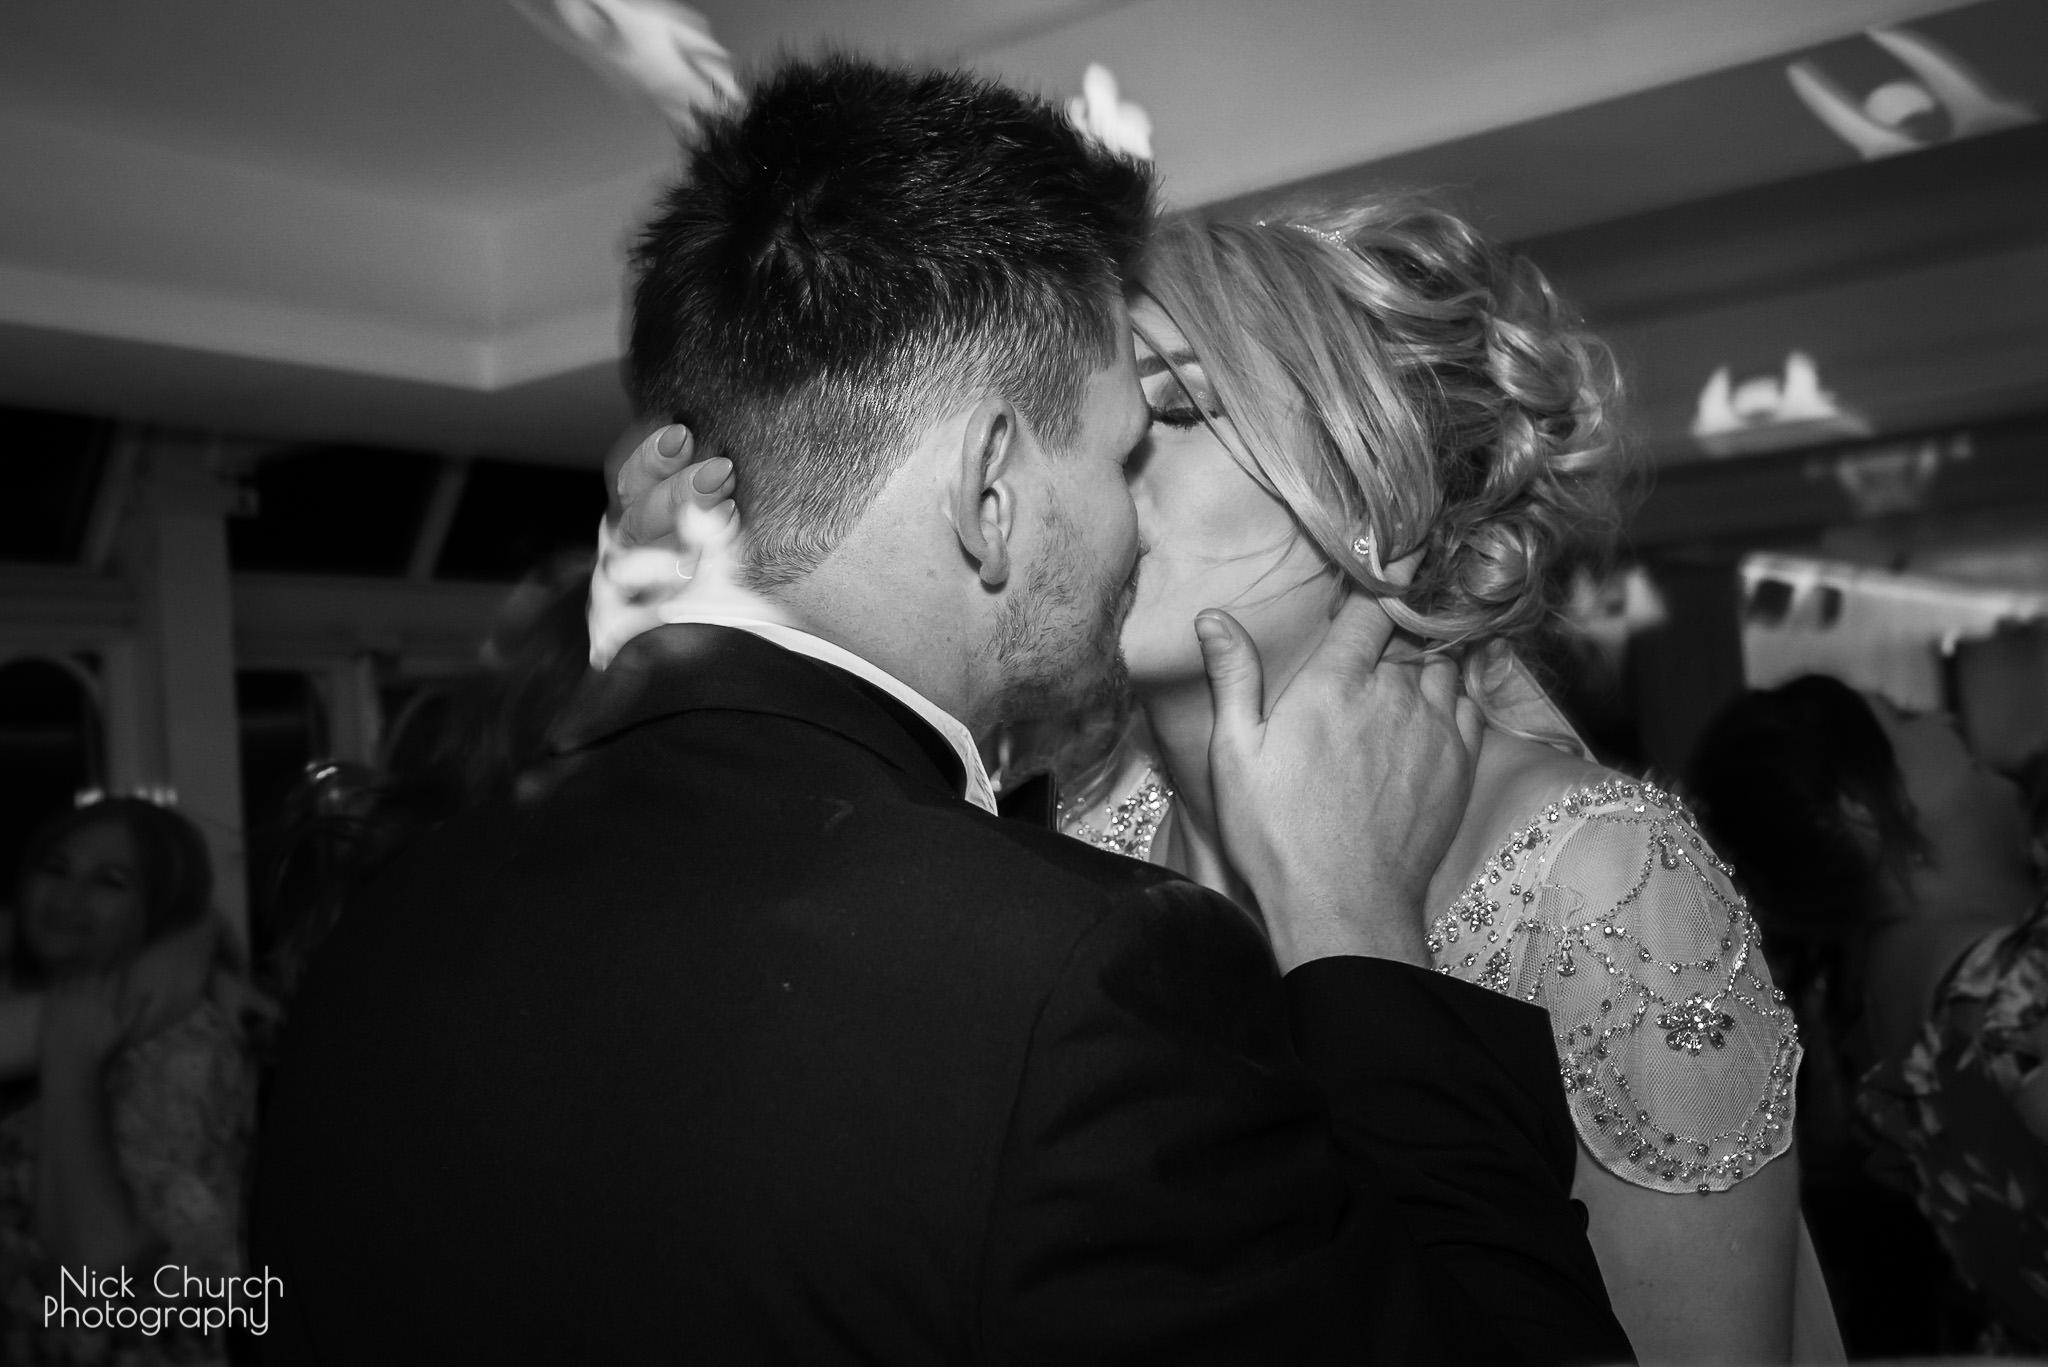 NC-20180317-stacy-and-mike-wedding-2466.jpg